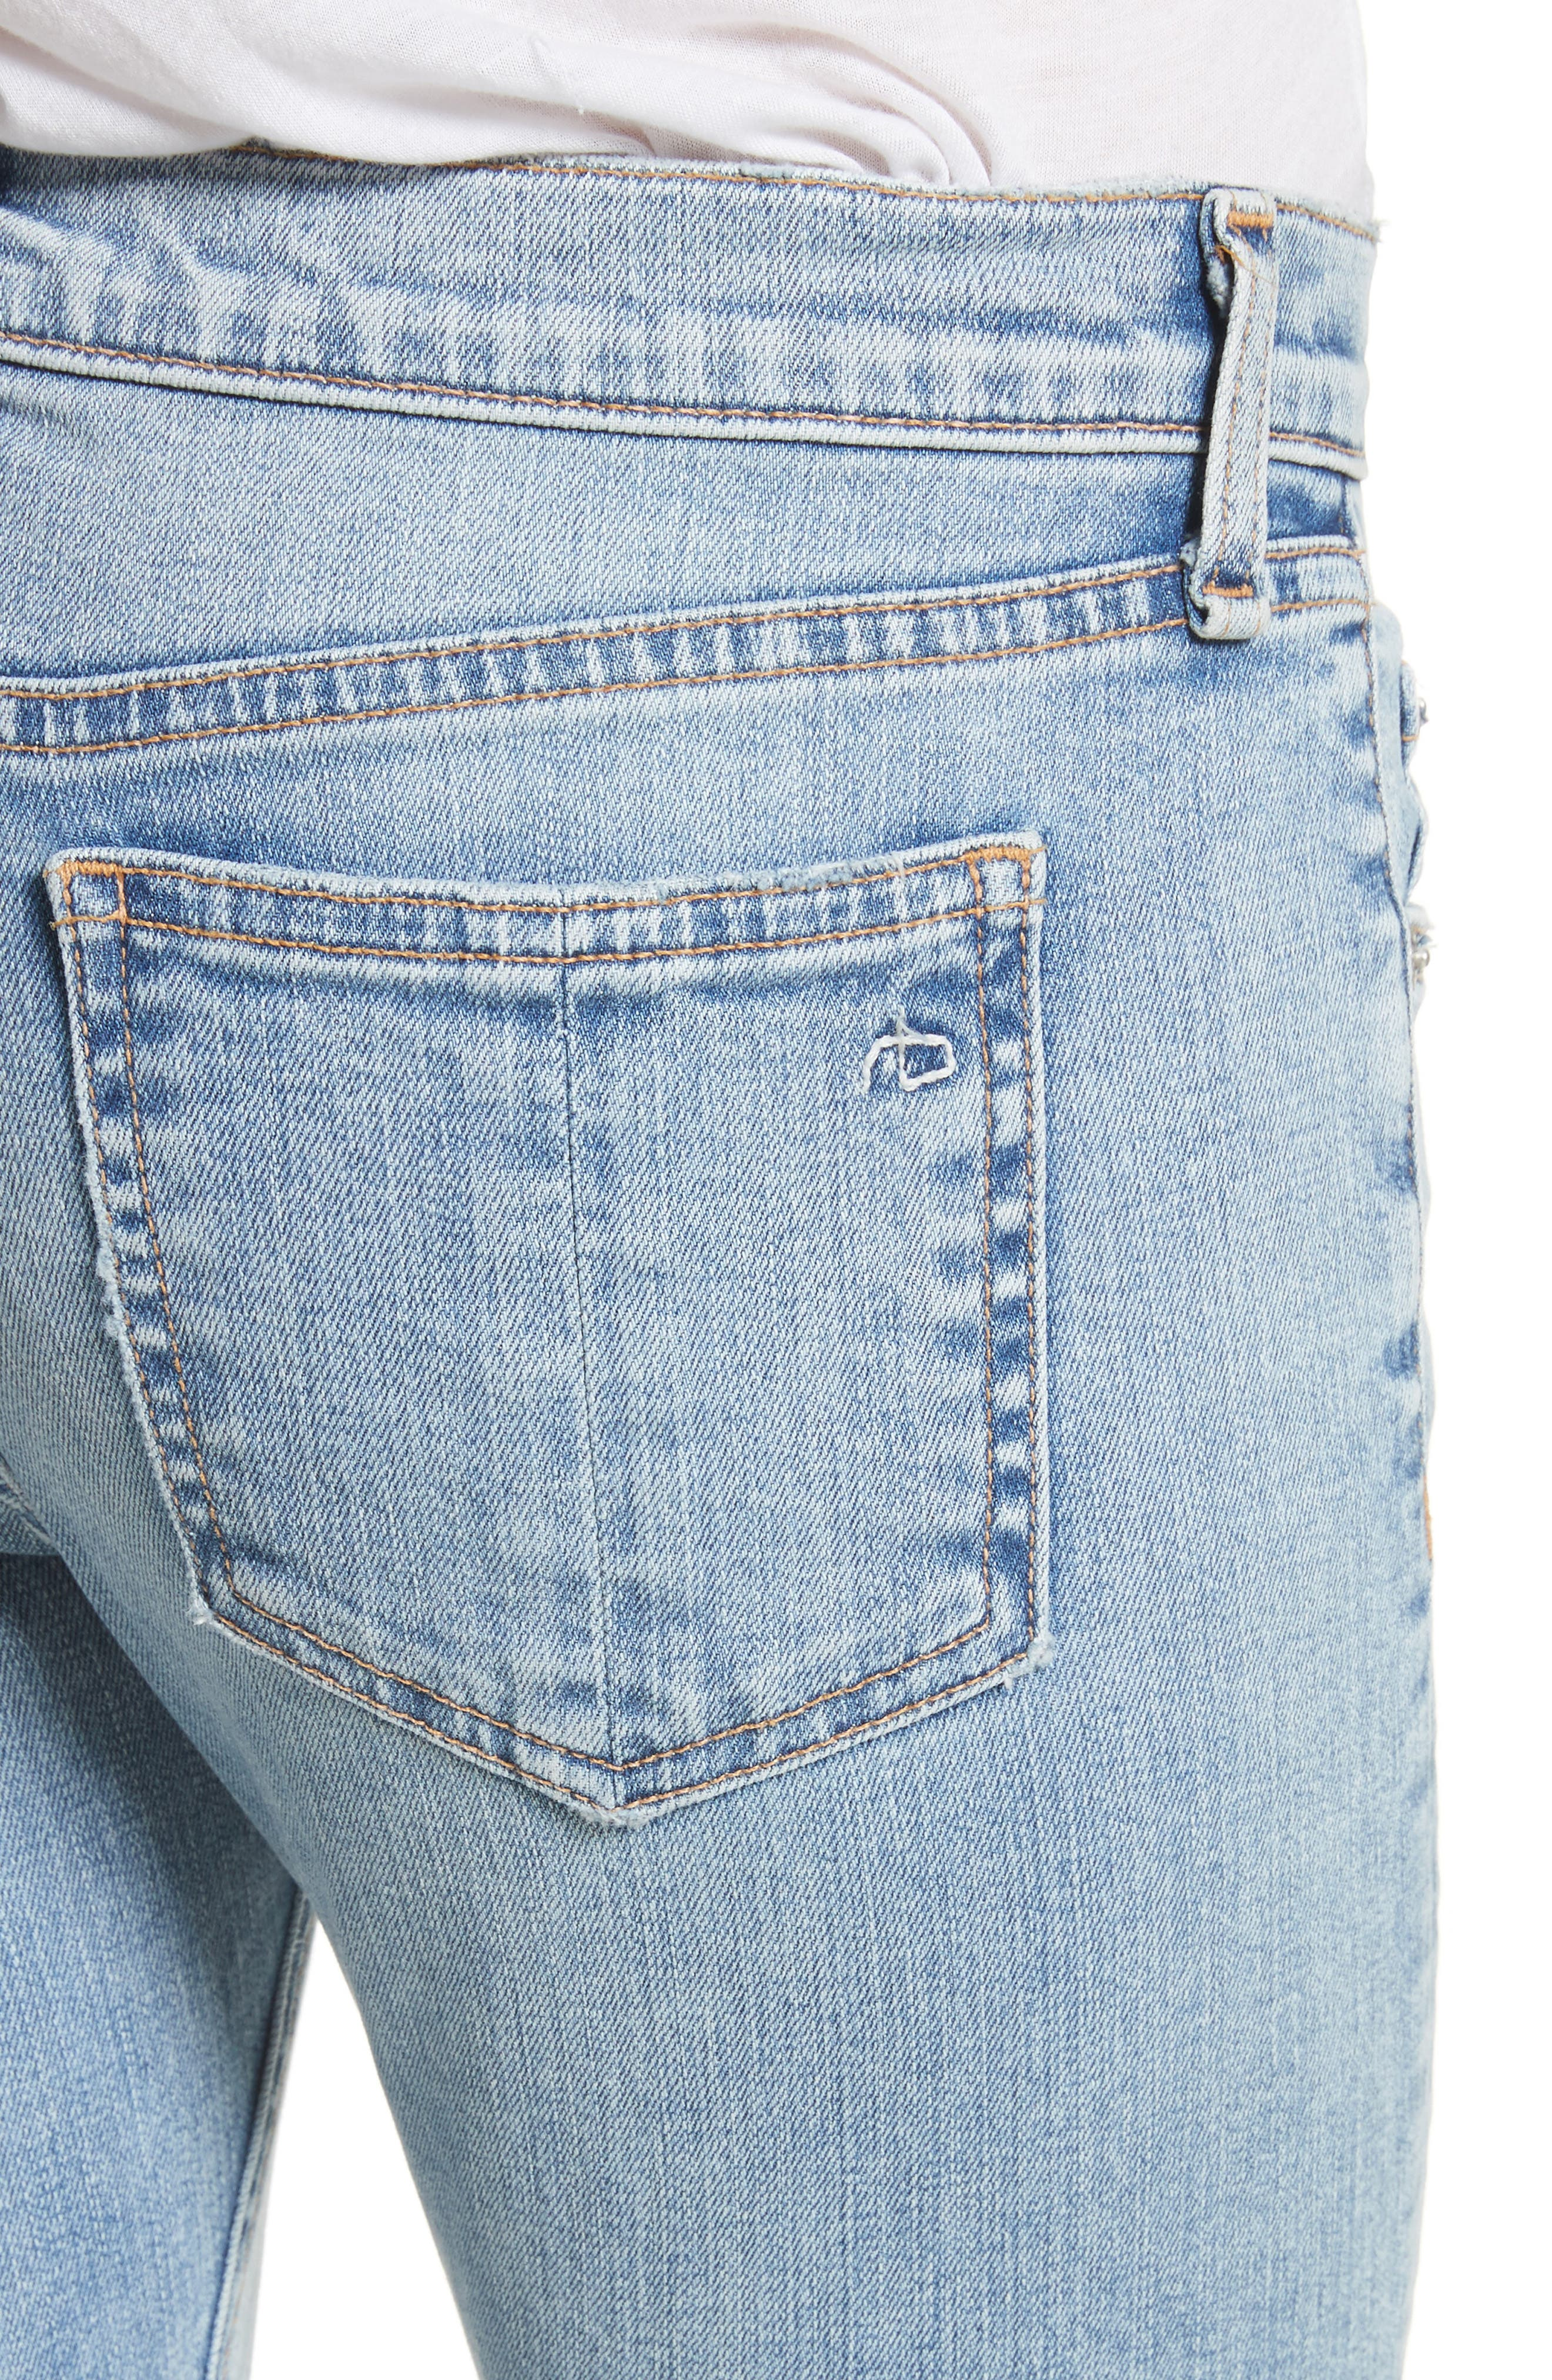 Ankle Skinny Jeans,                             Alternate thumbnail 4, color,                             450